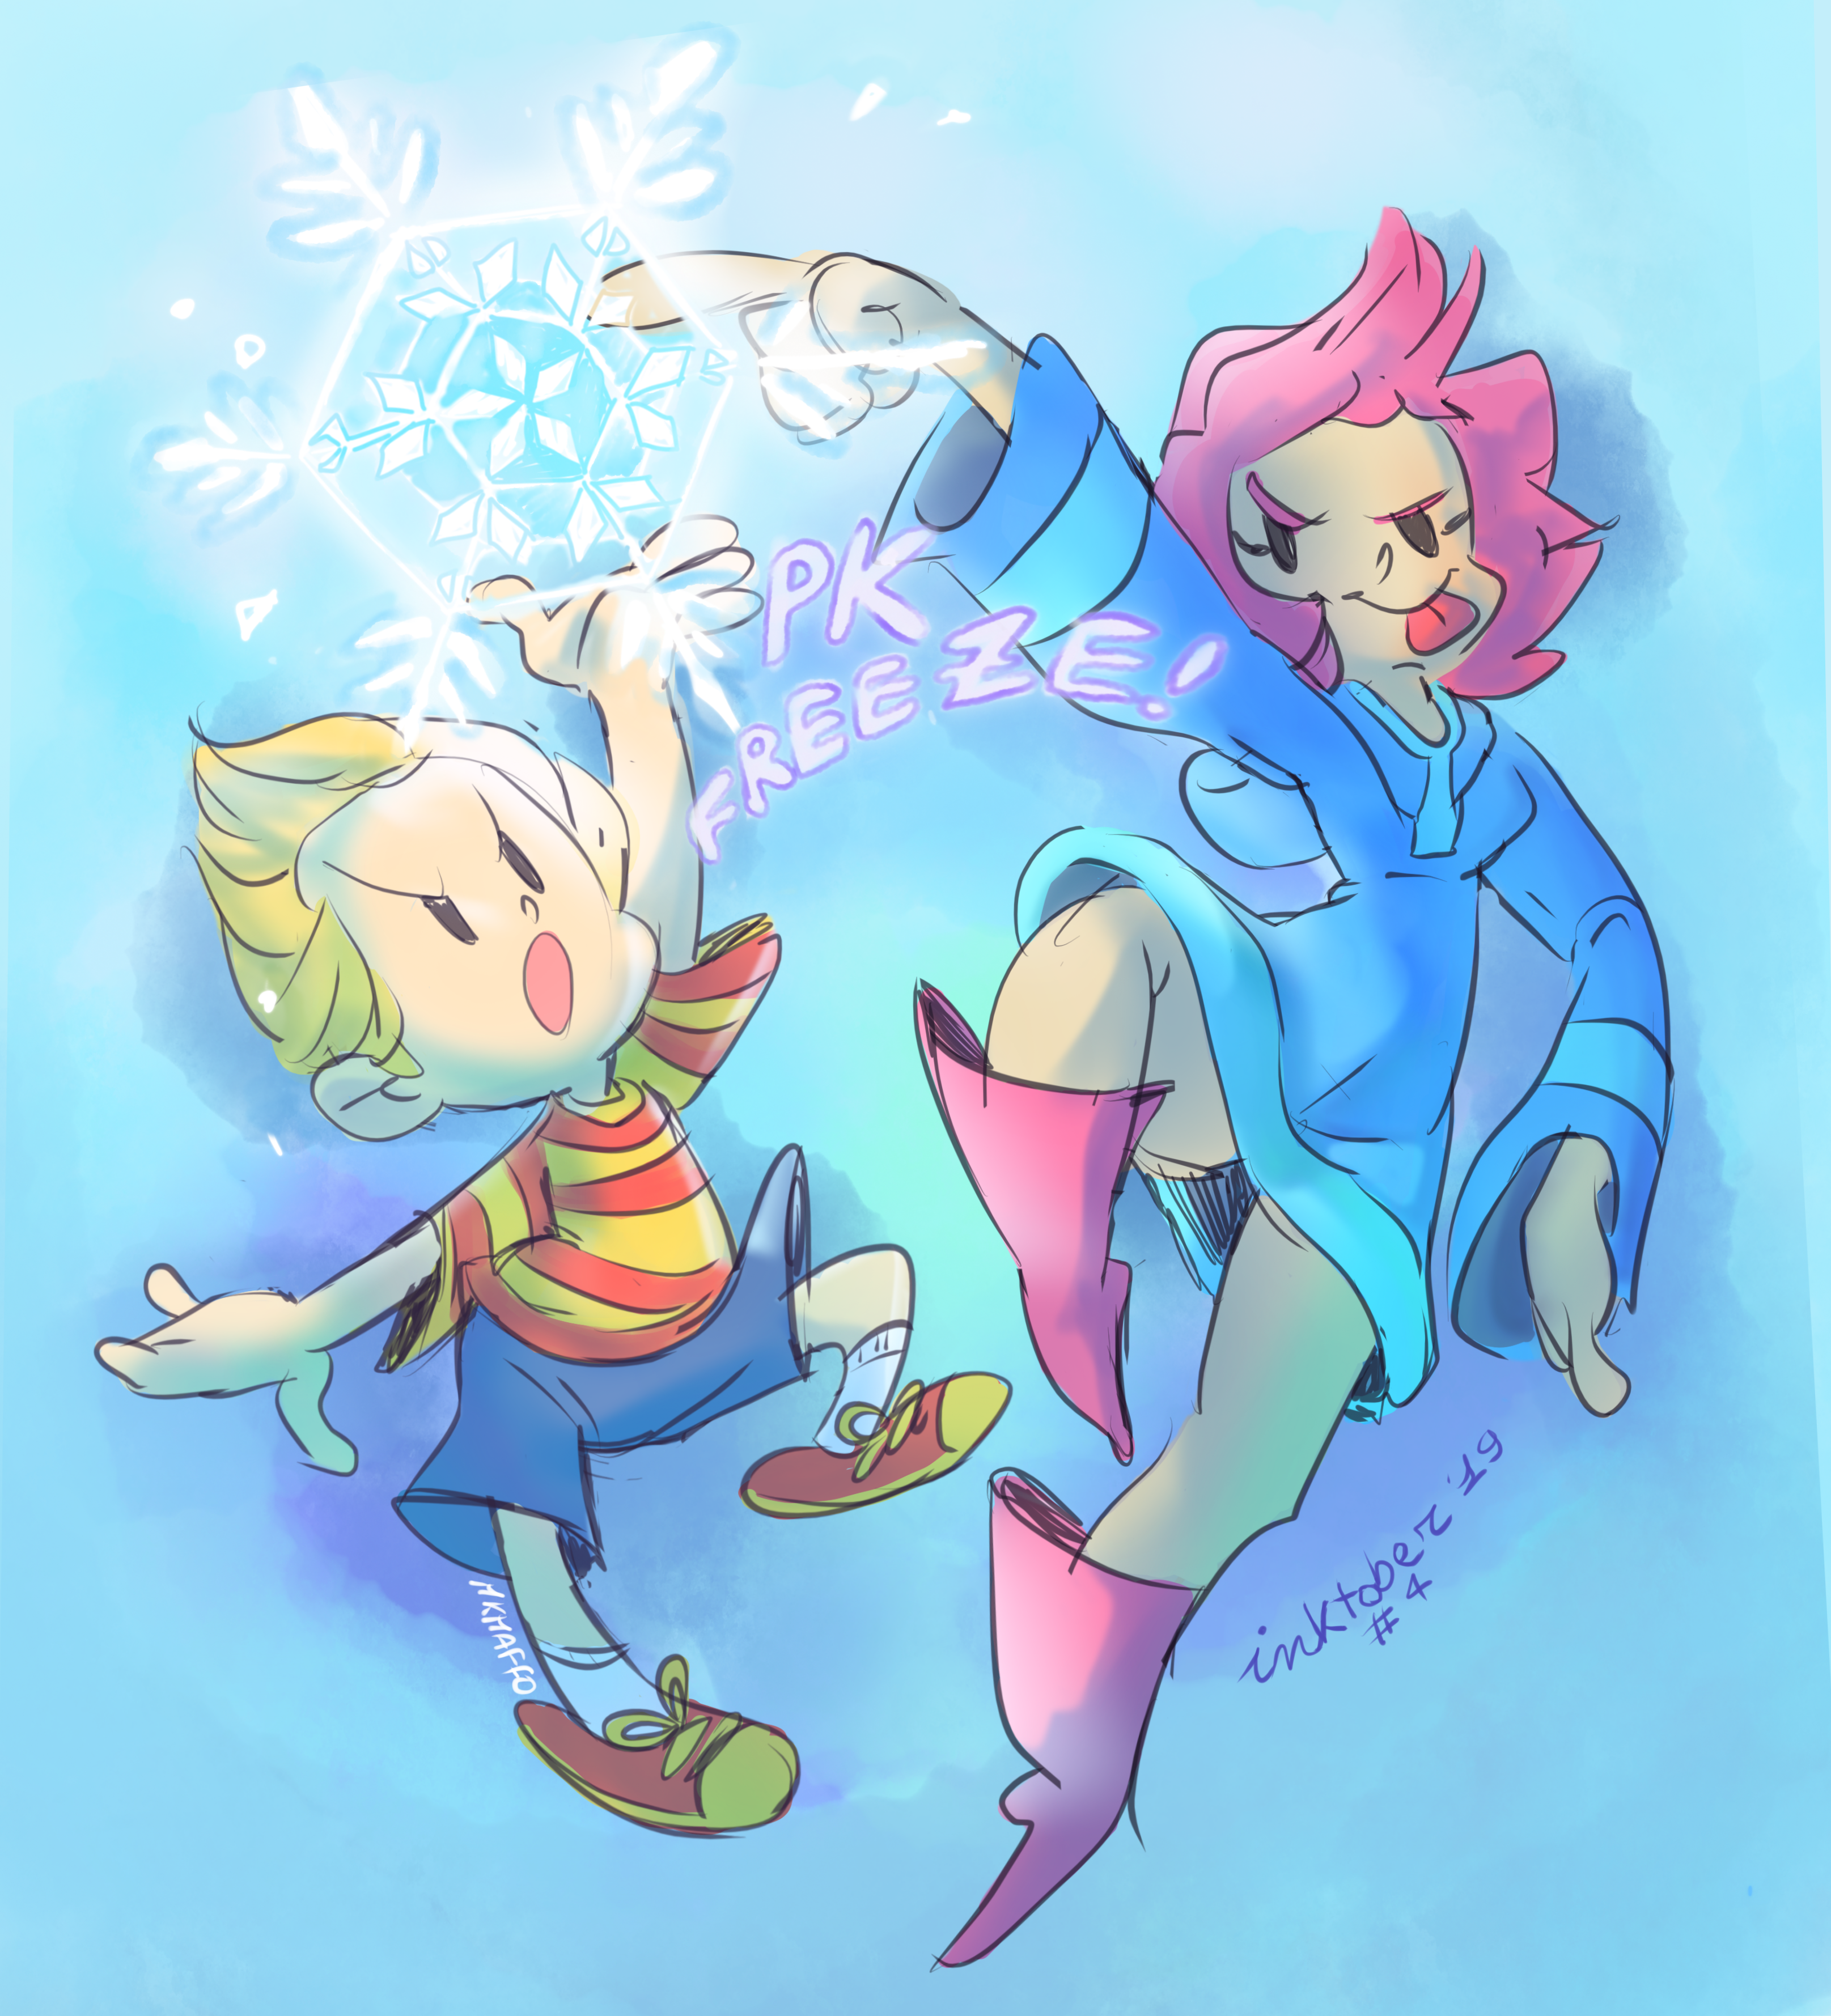 #4 Freeze - Inktober'19